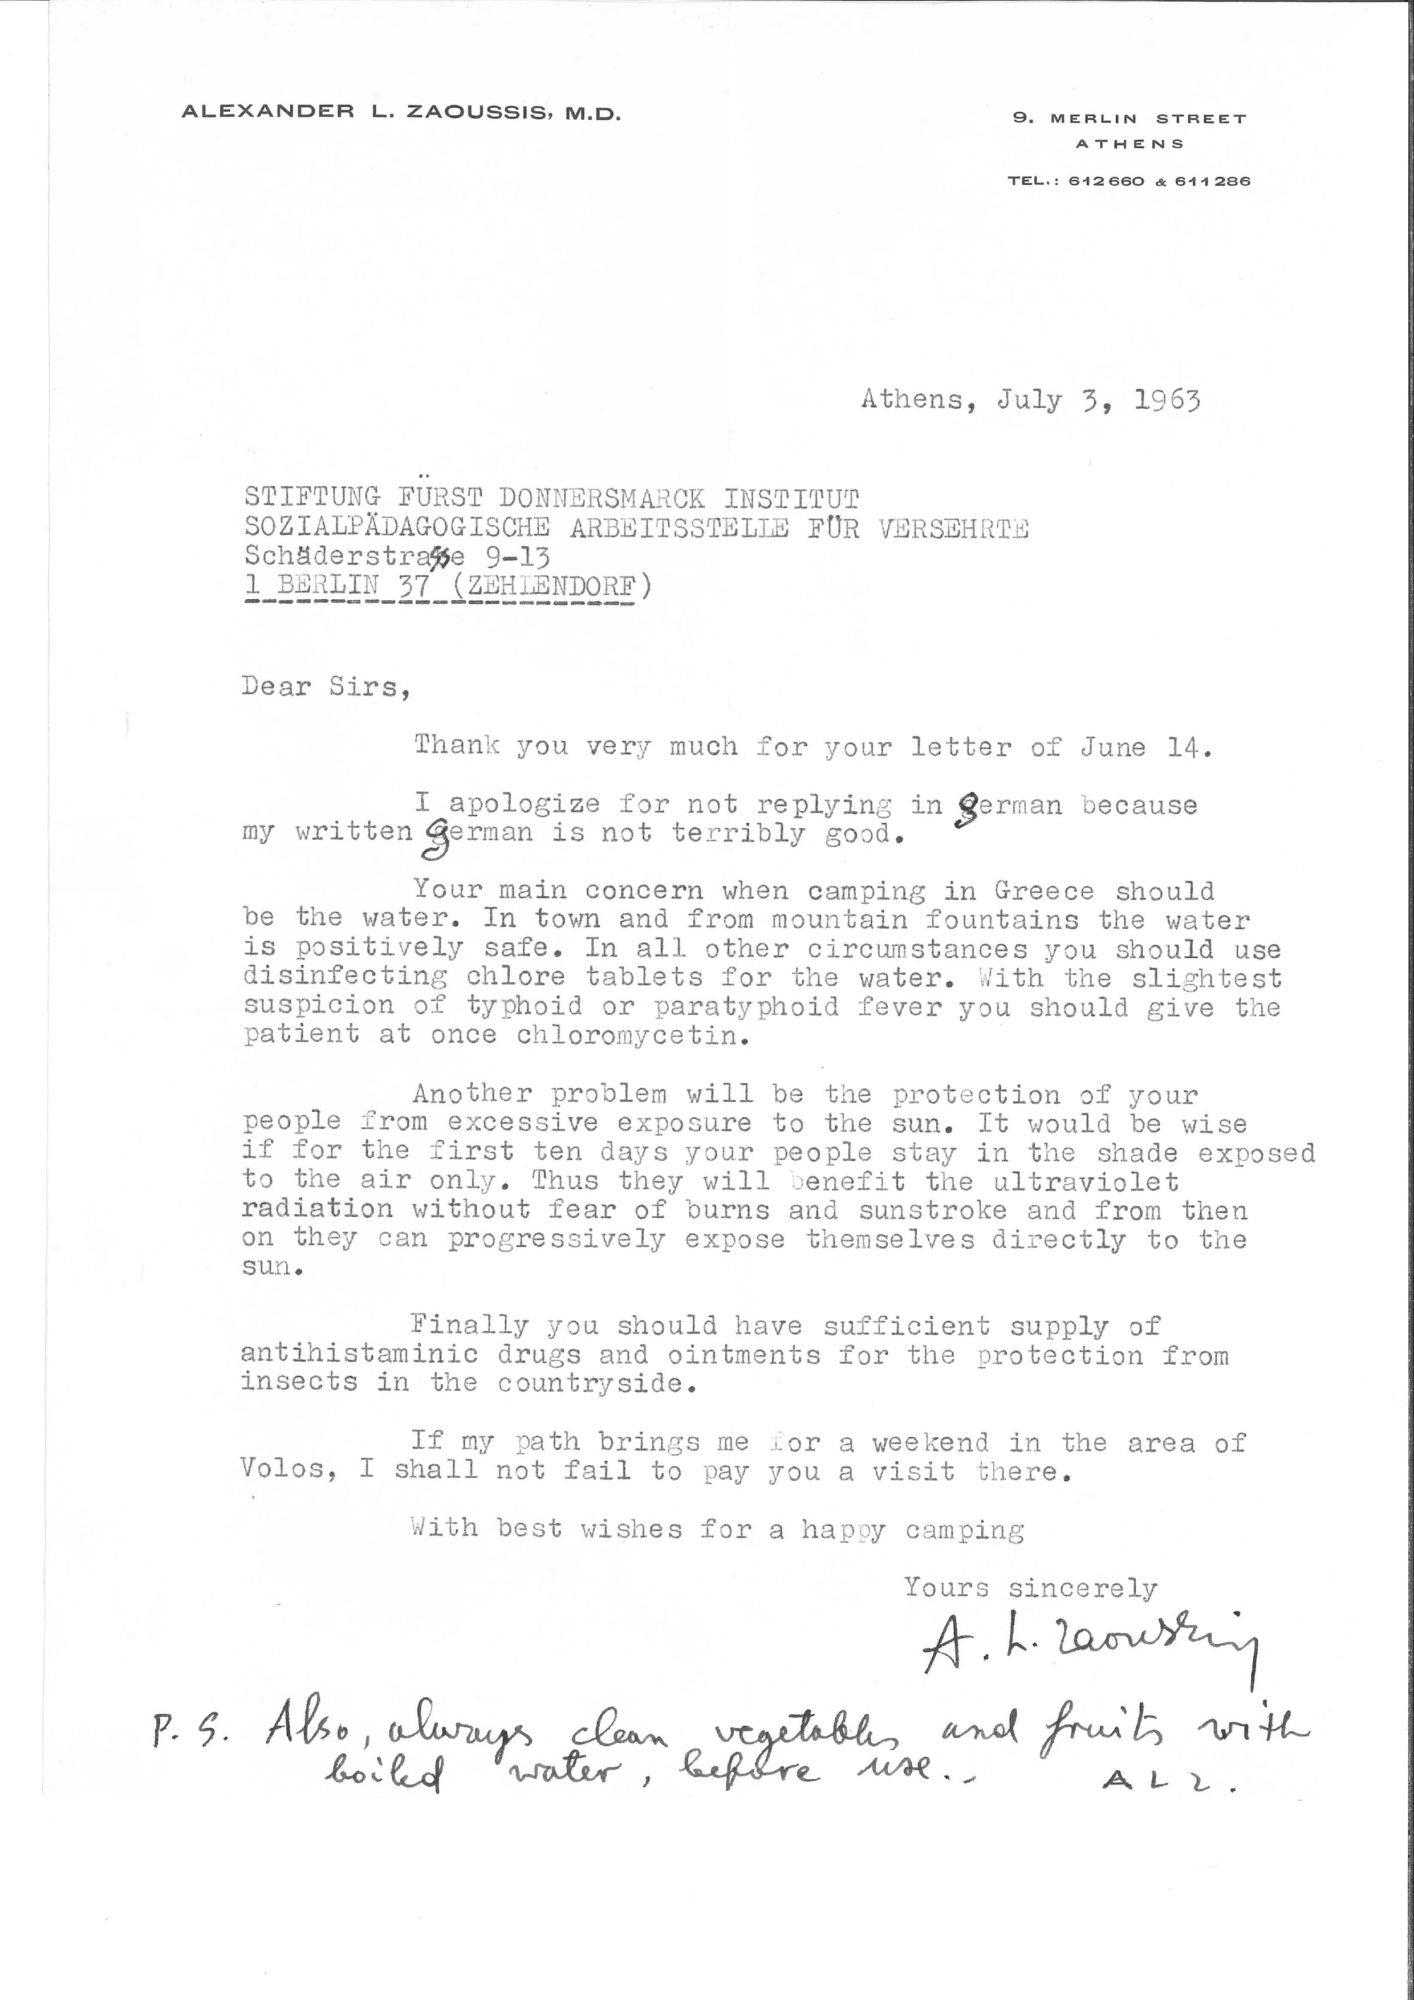 Scan des Briefes des Orthopäden Dr. Alexander L. Zaoussis.